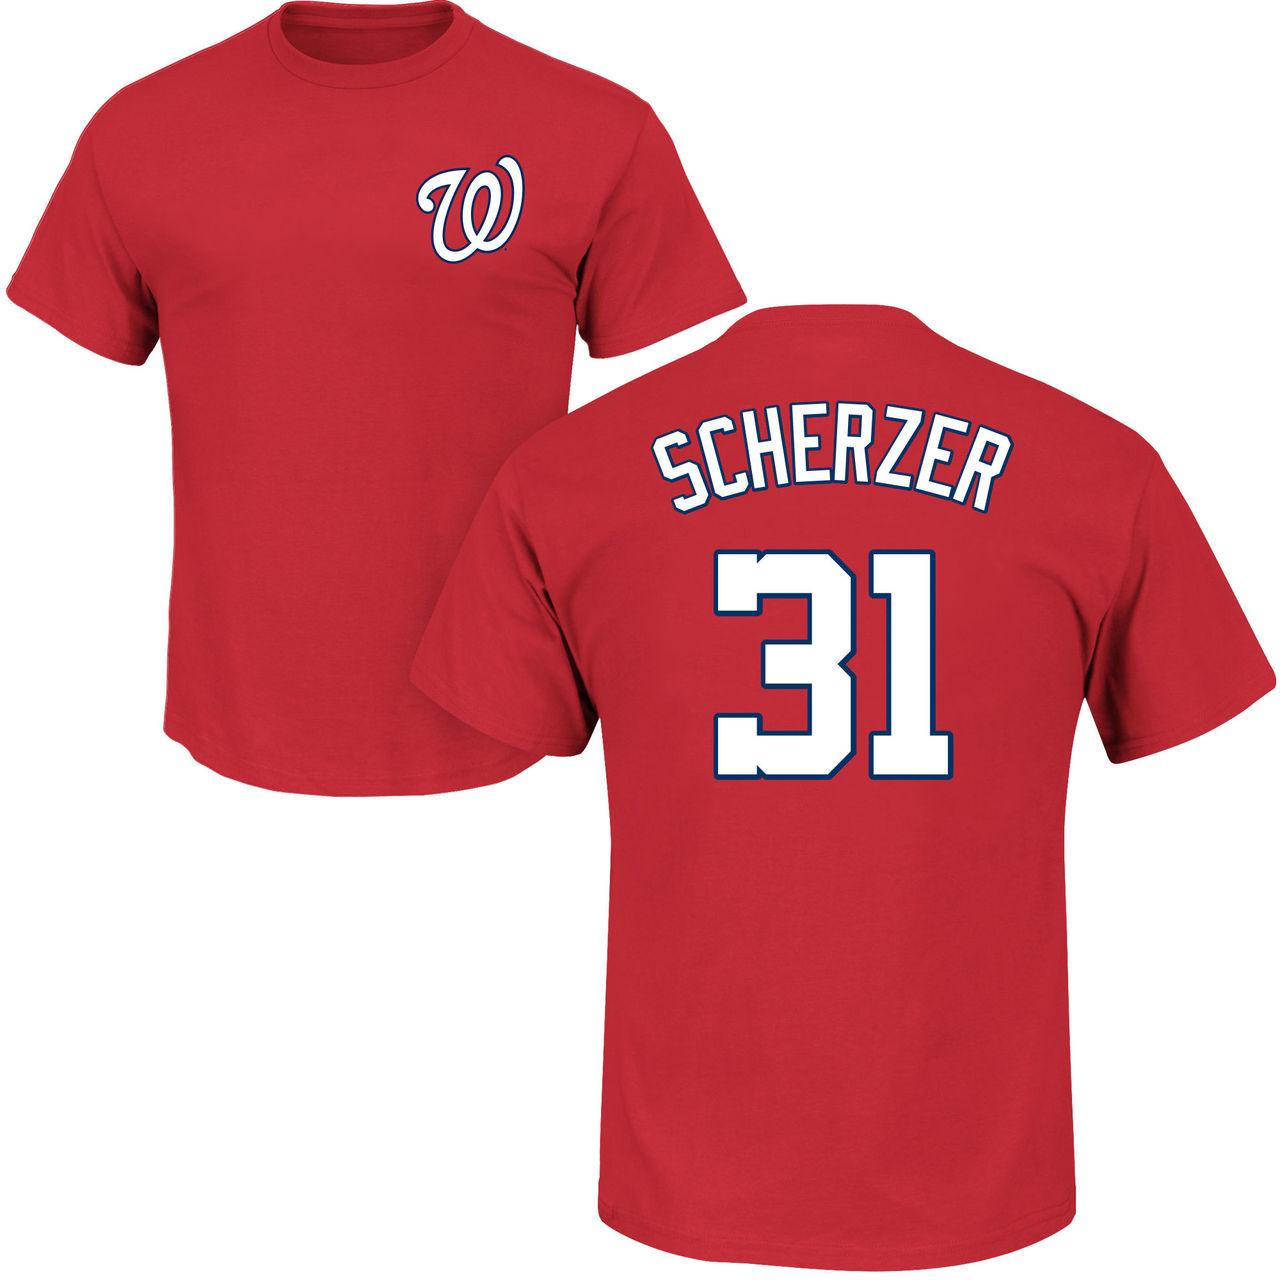 size 40 6b8f1 01f84 Max Scherzer T-Shirt – Red Washington Nationals Adult T ...